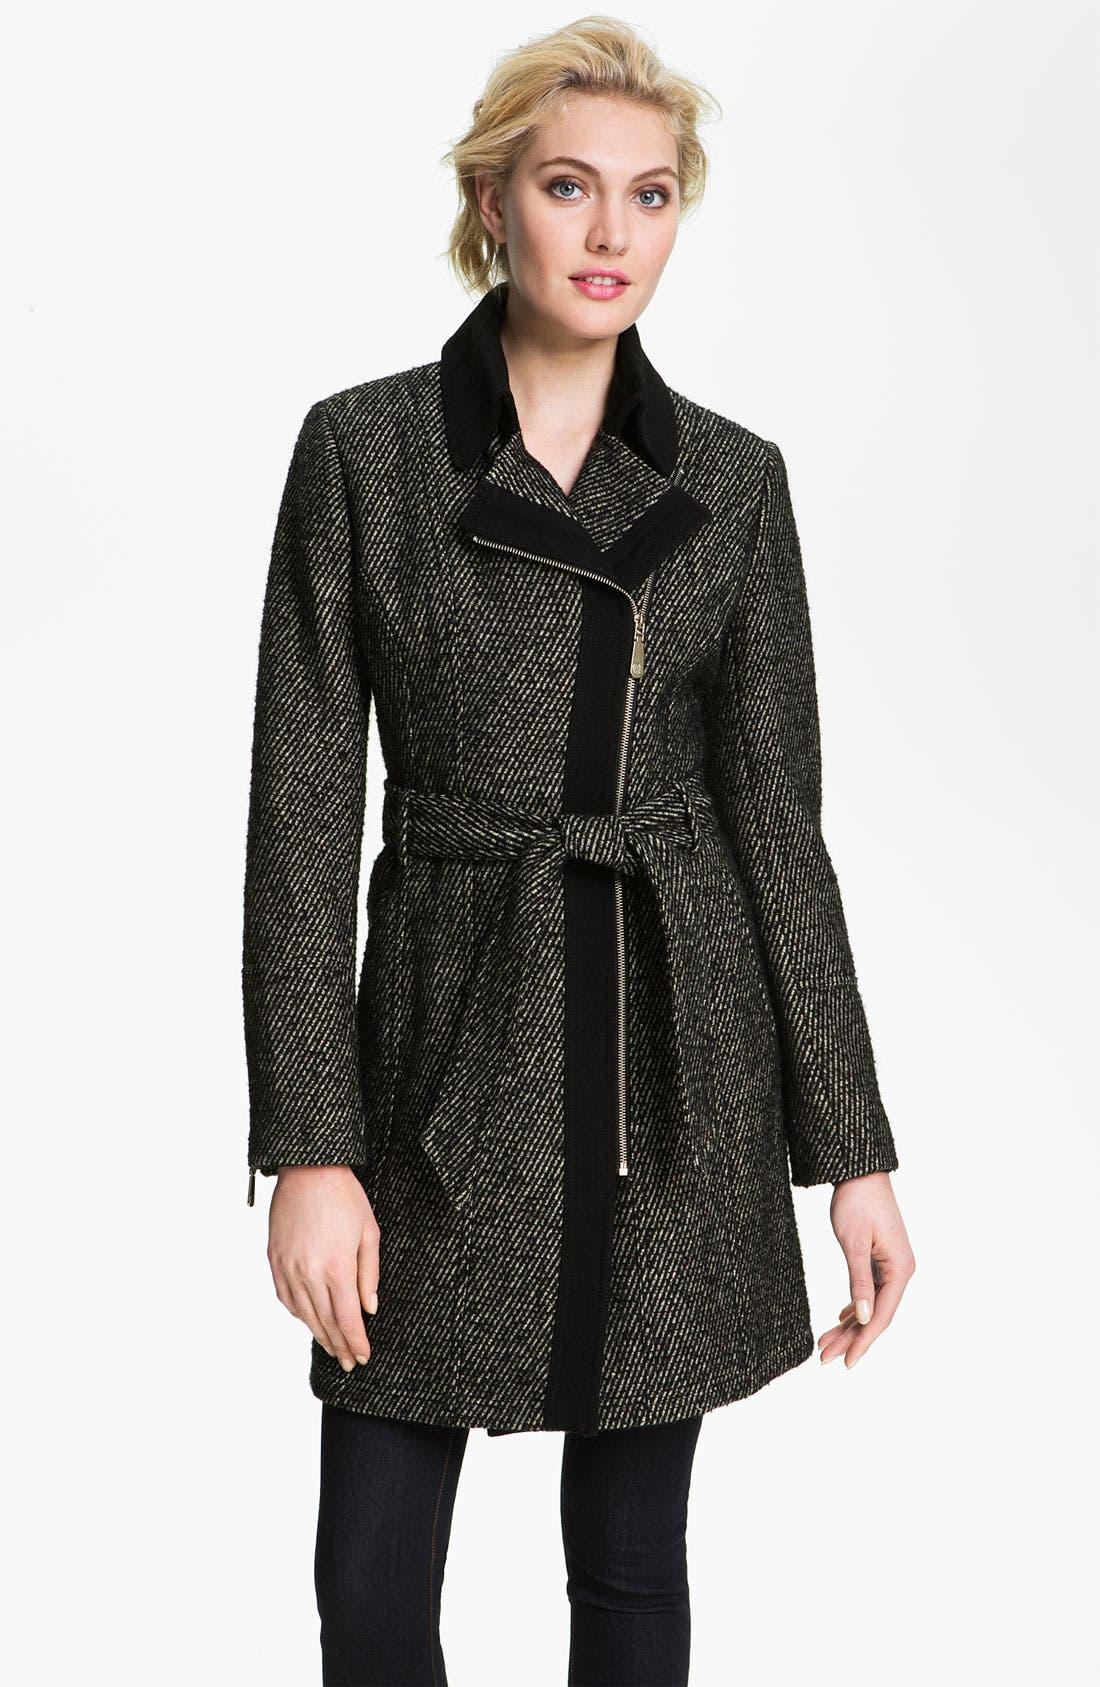 Alternate Image 1 Selected - Vince Camuto Asymmetrical Zip Tweed Trench Coat